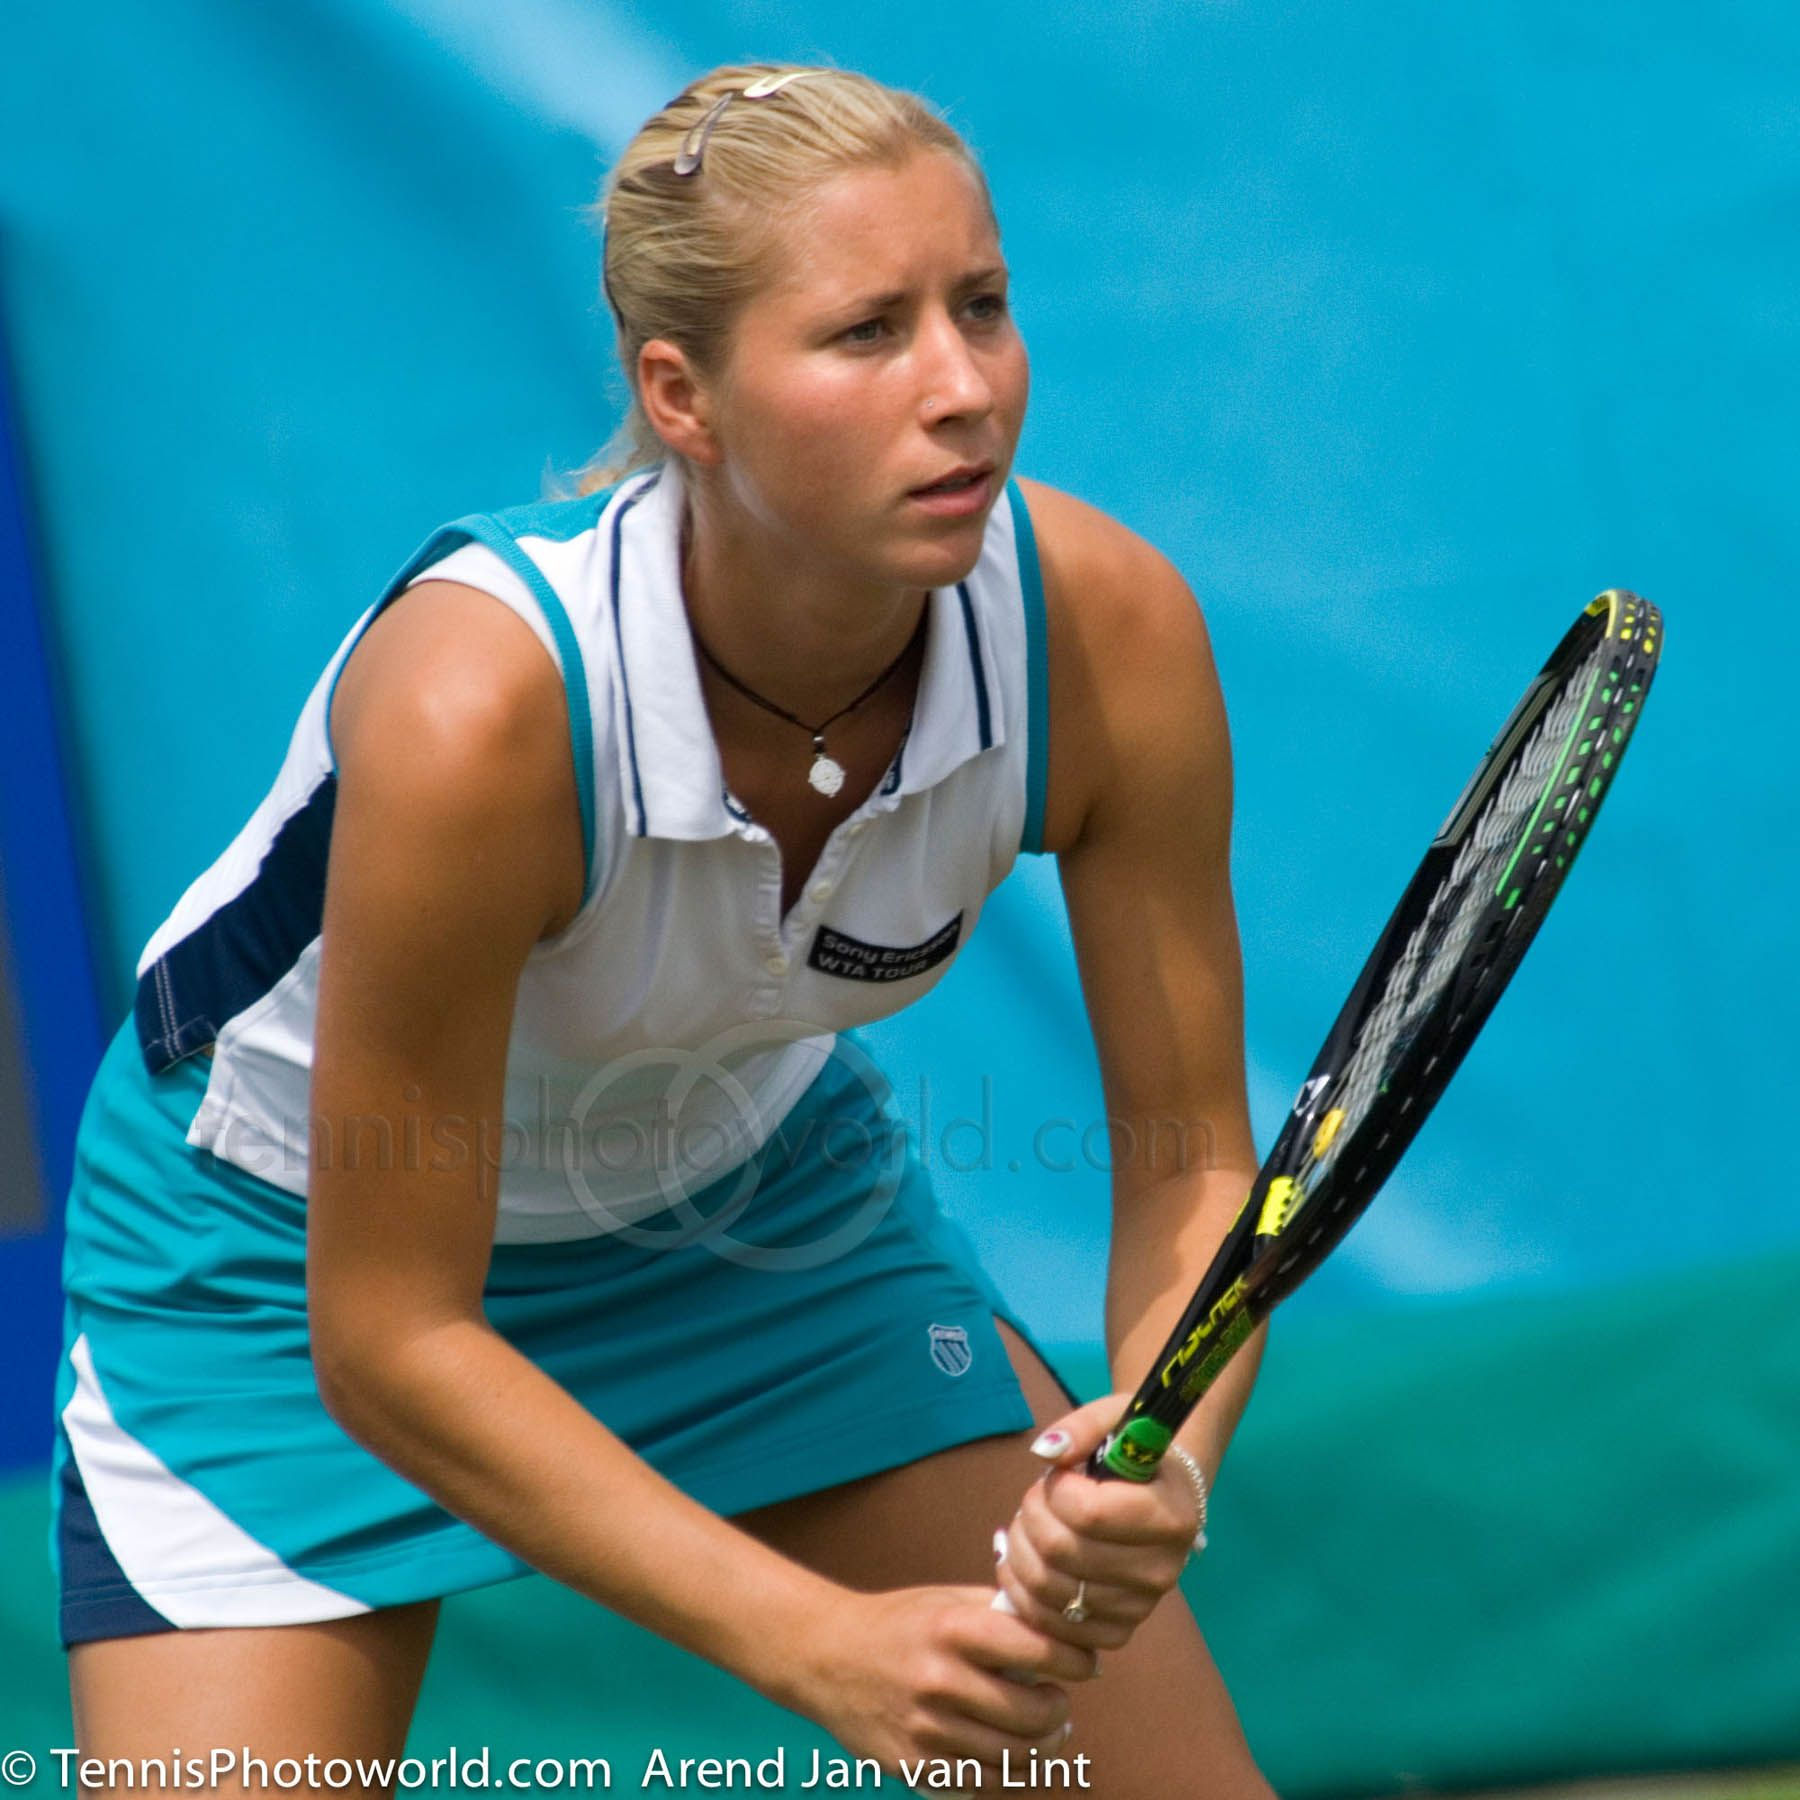 Alona Bondarenko, Tennis Player | Leaked Celebs | Pinterest ...